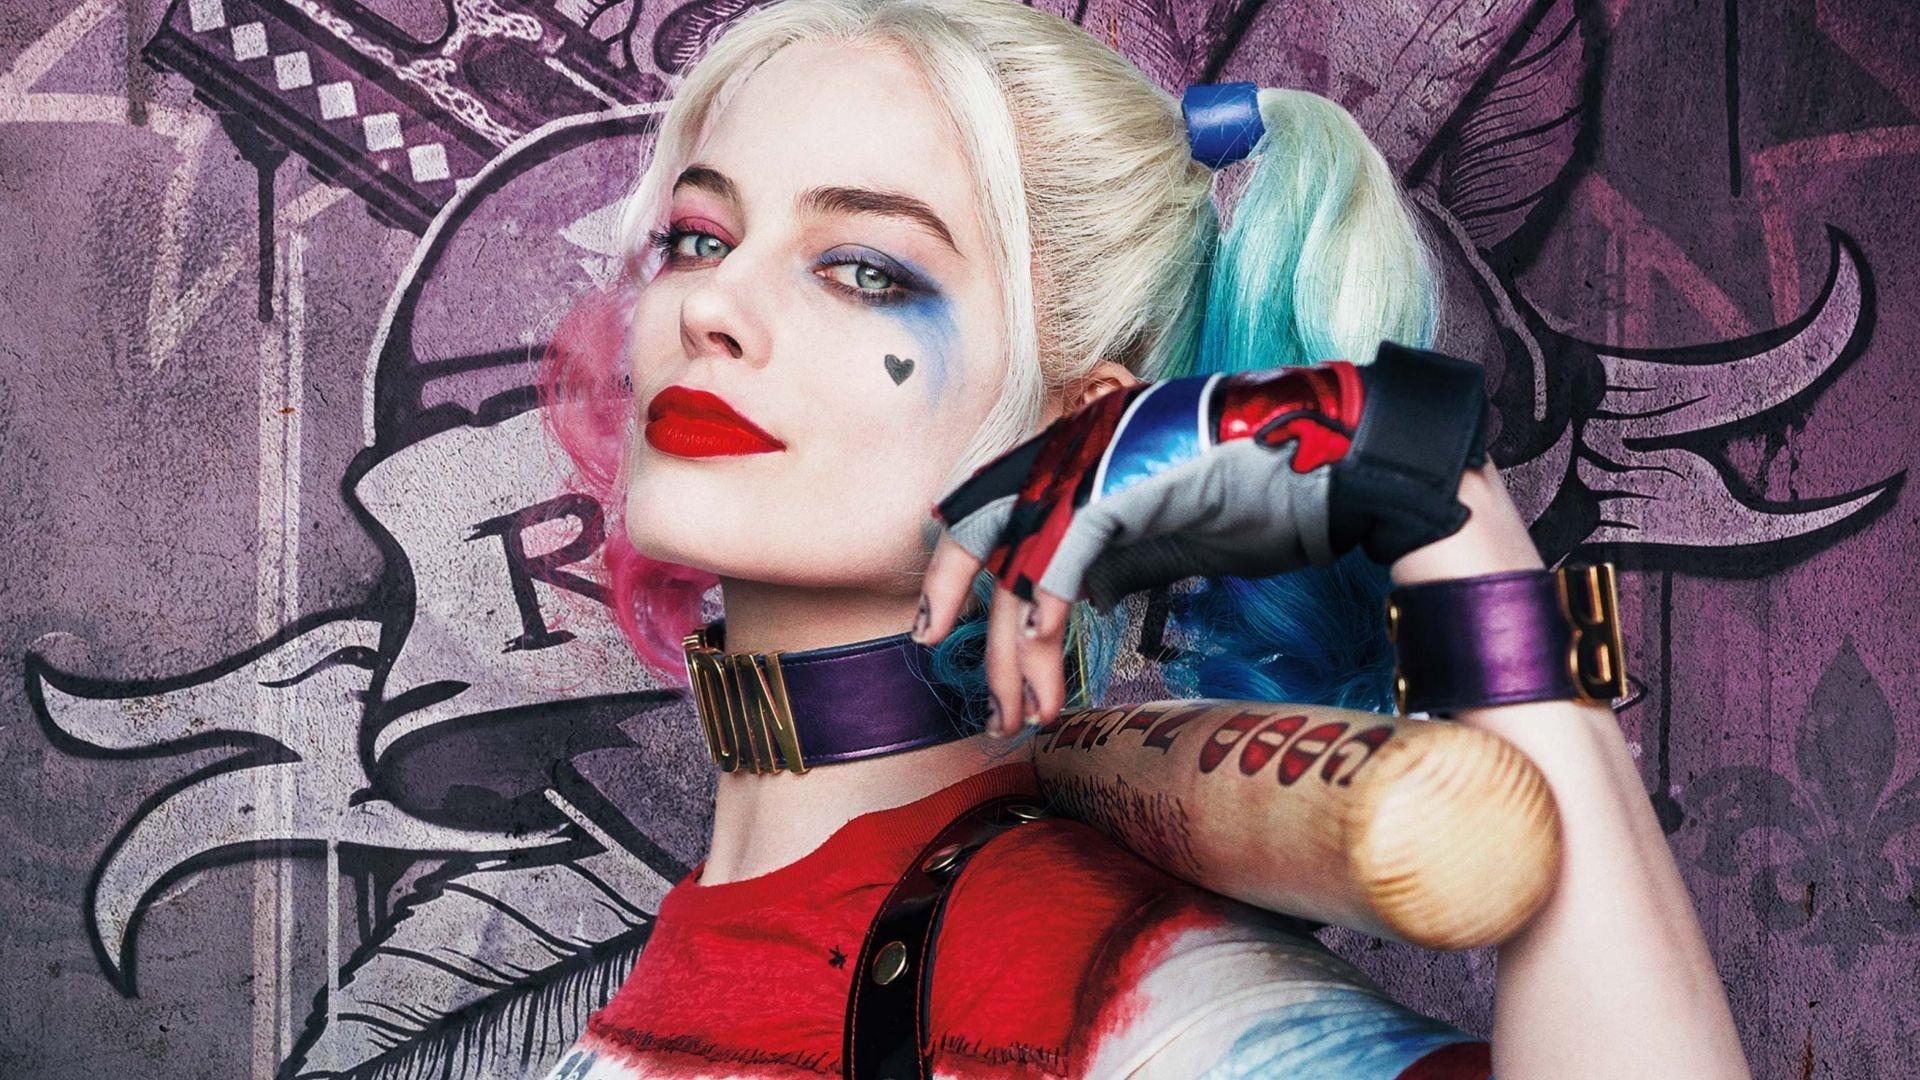 Harley Quinn windows background